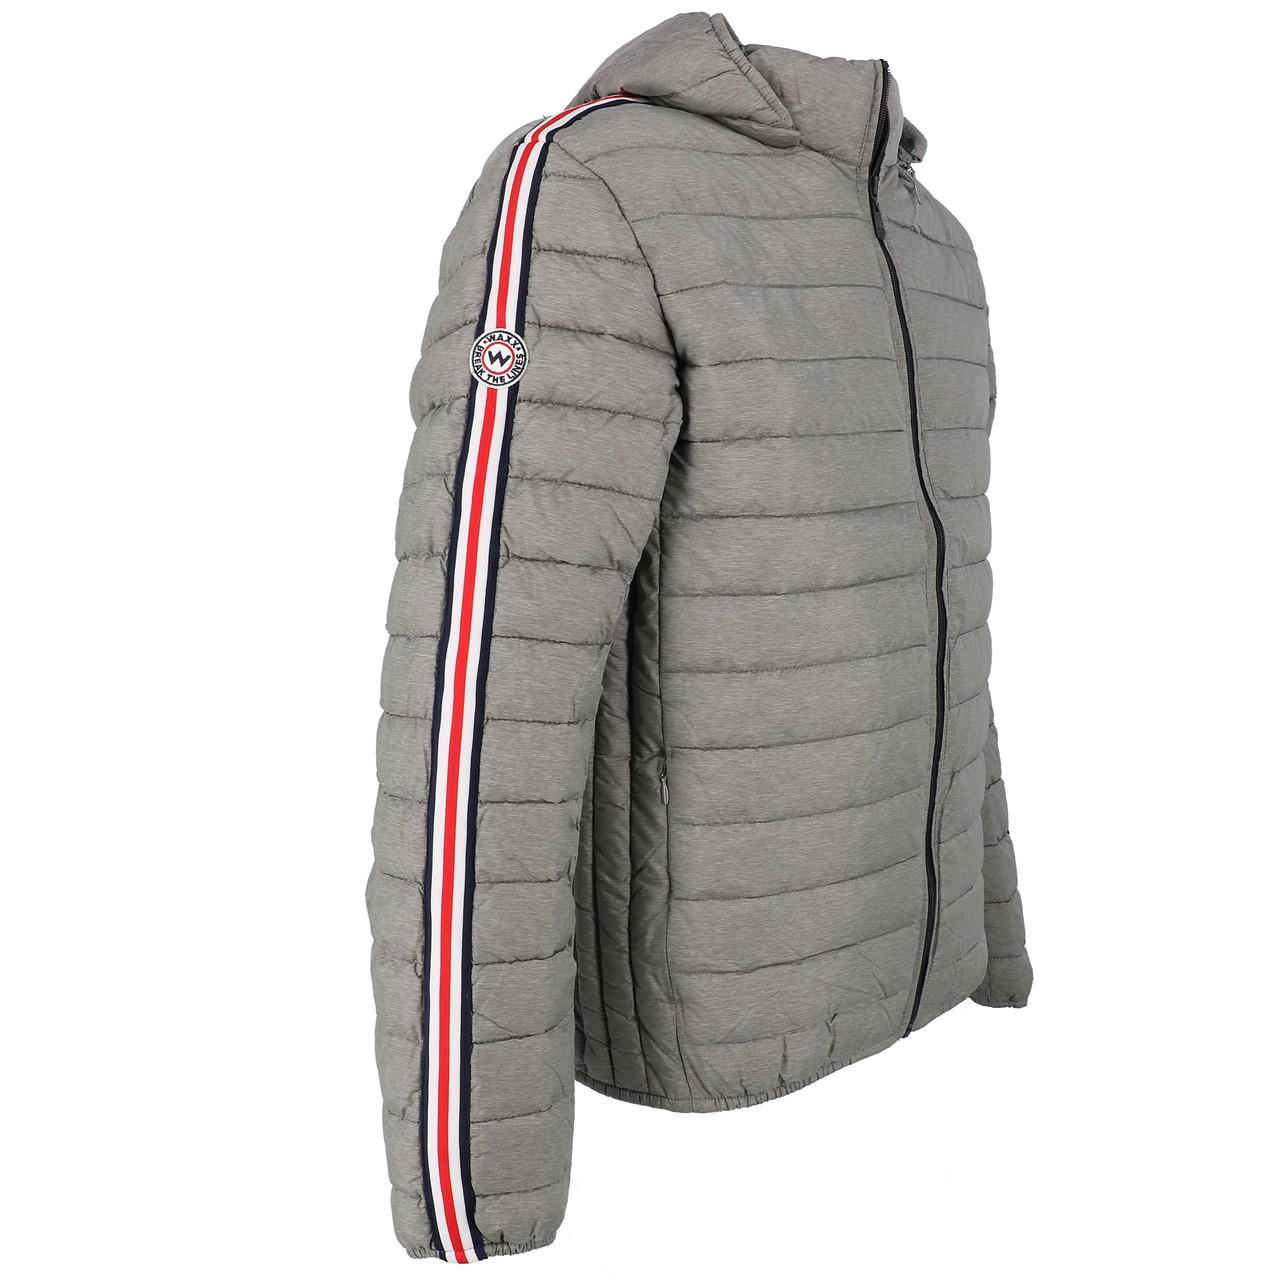 Synthetic-Jackets-Waxx-Shelter-Stripes-Metal-H-Grey-50764-New thumbnail 3